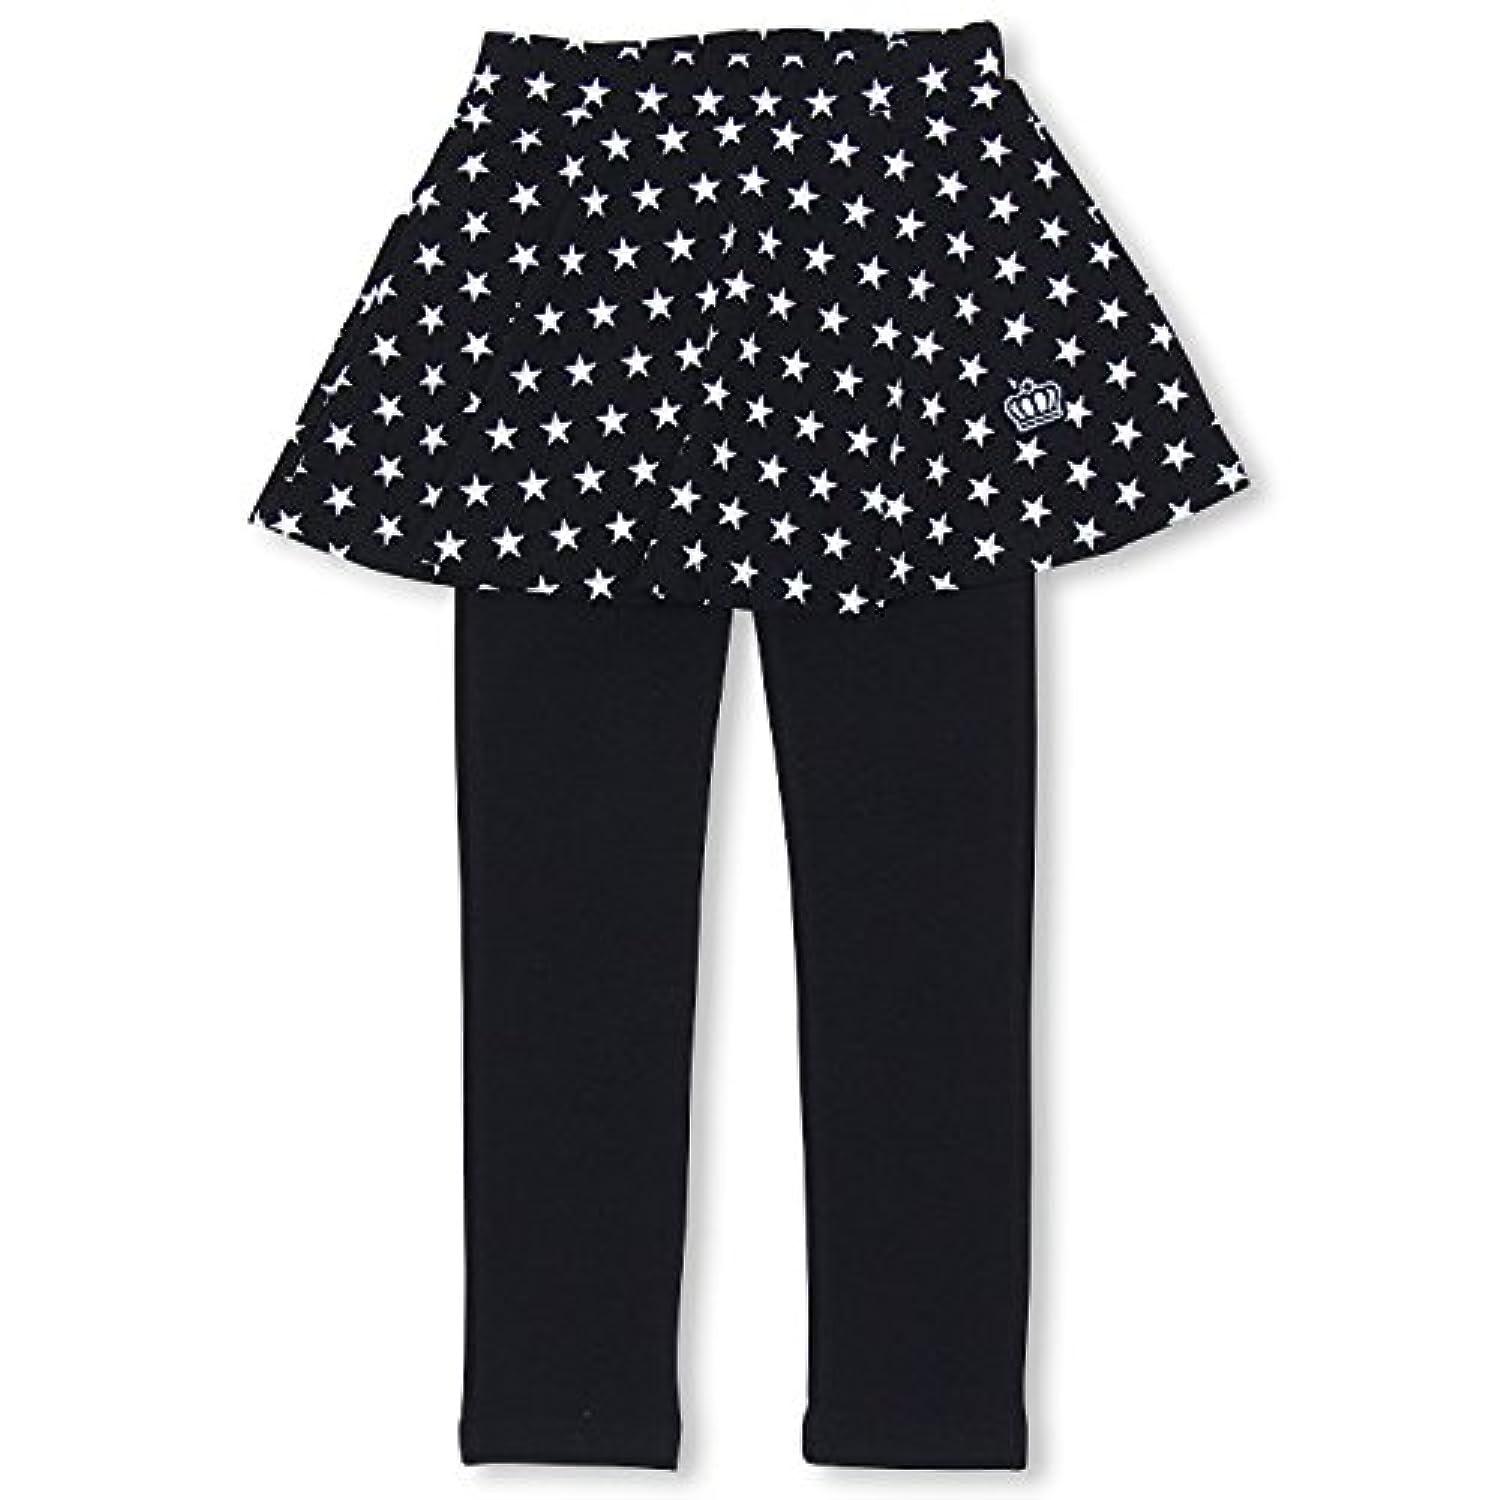 BABYDOLL(ベビードール) スカッツ スカート付 ウルトラストレッチパンツ 子供服 ベビー 90 6星柄/ブラック